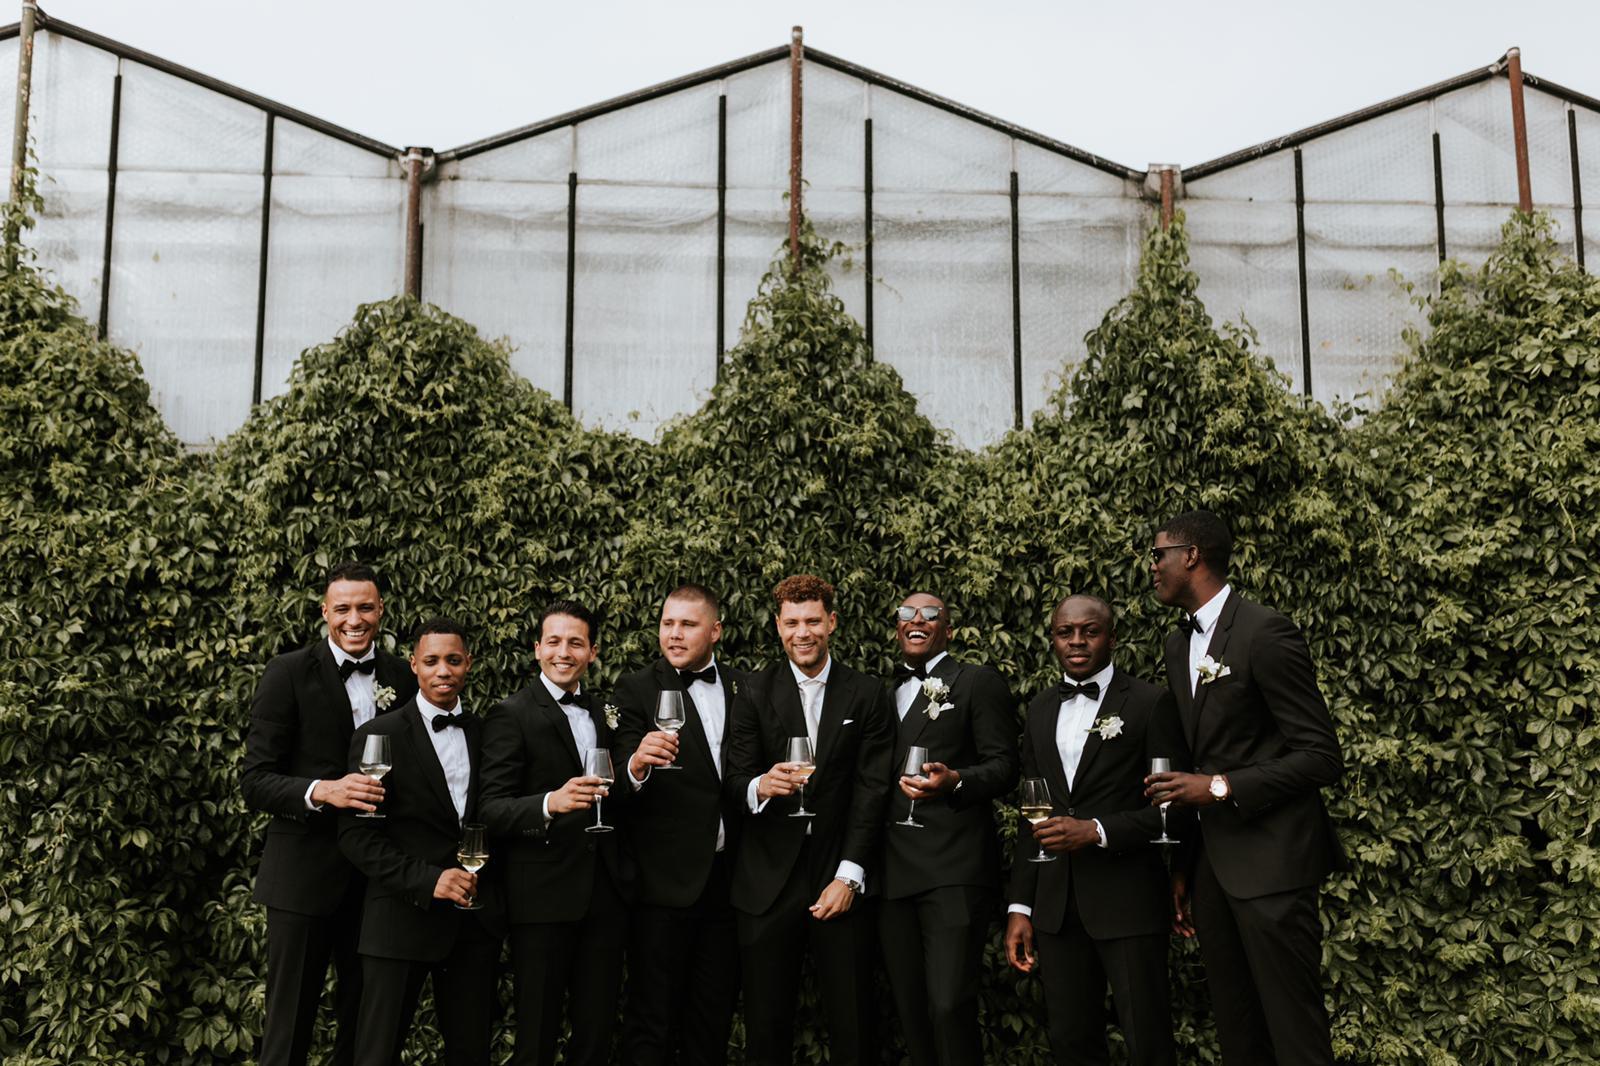 Wedding-Greenhouse-Amsterdam82.jpeg